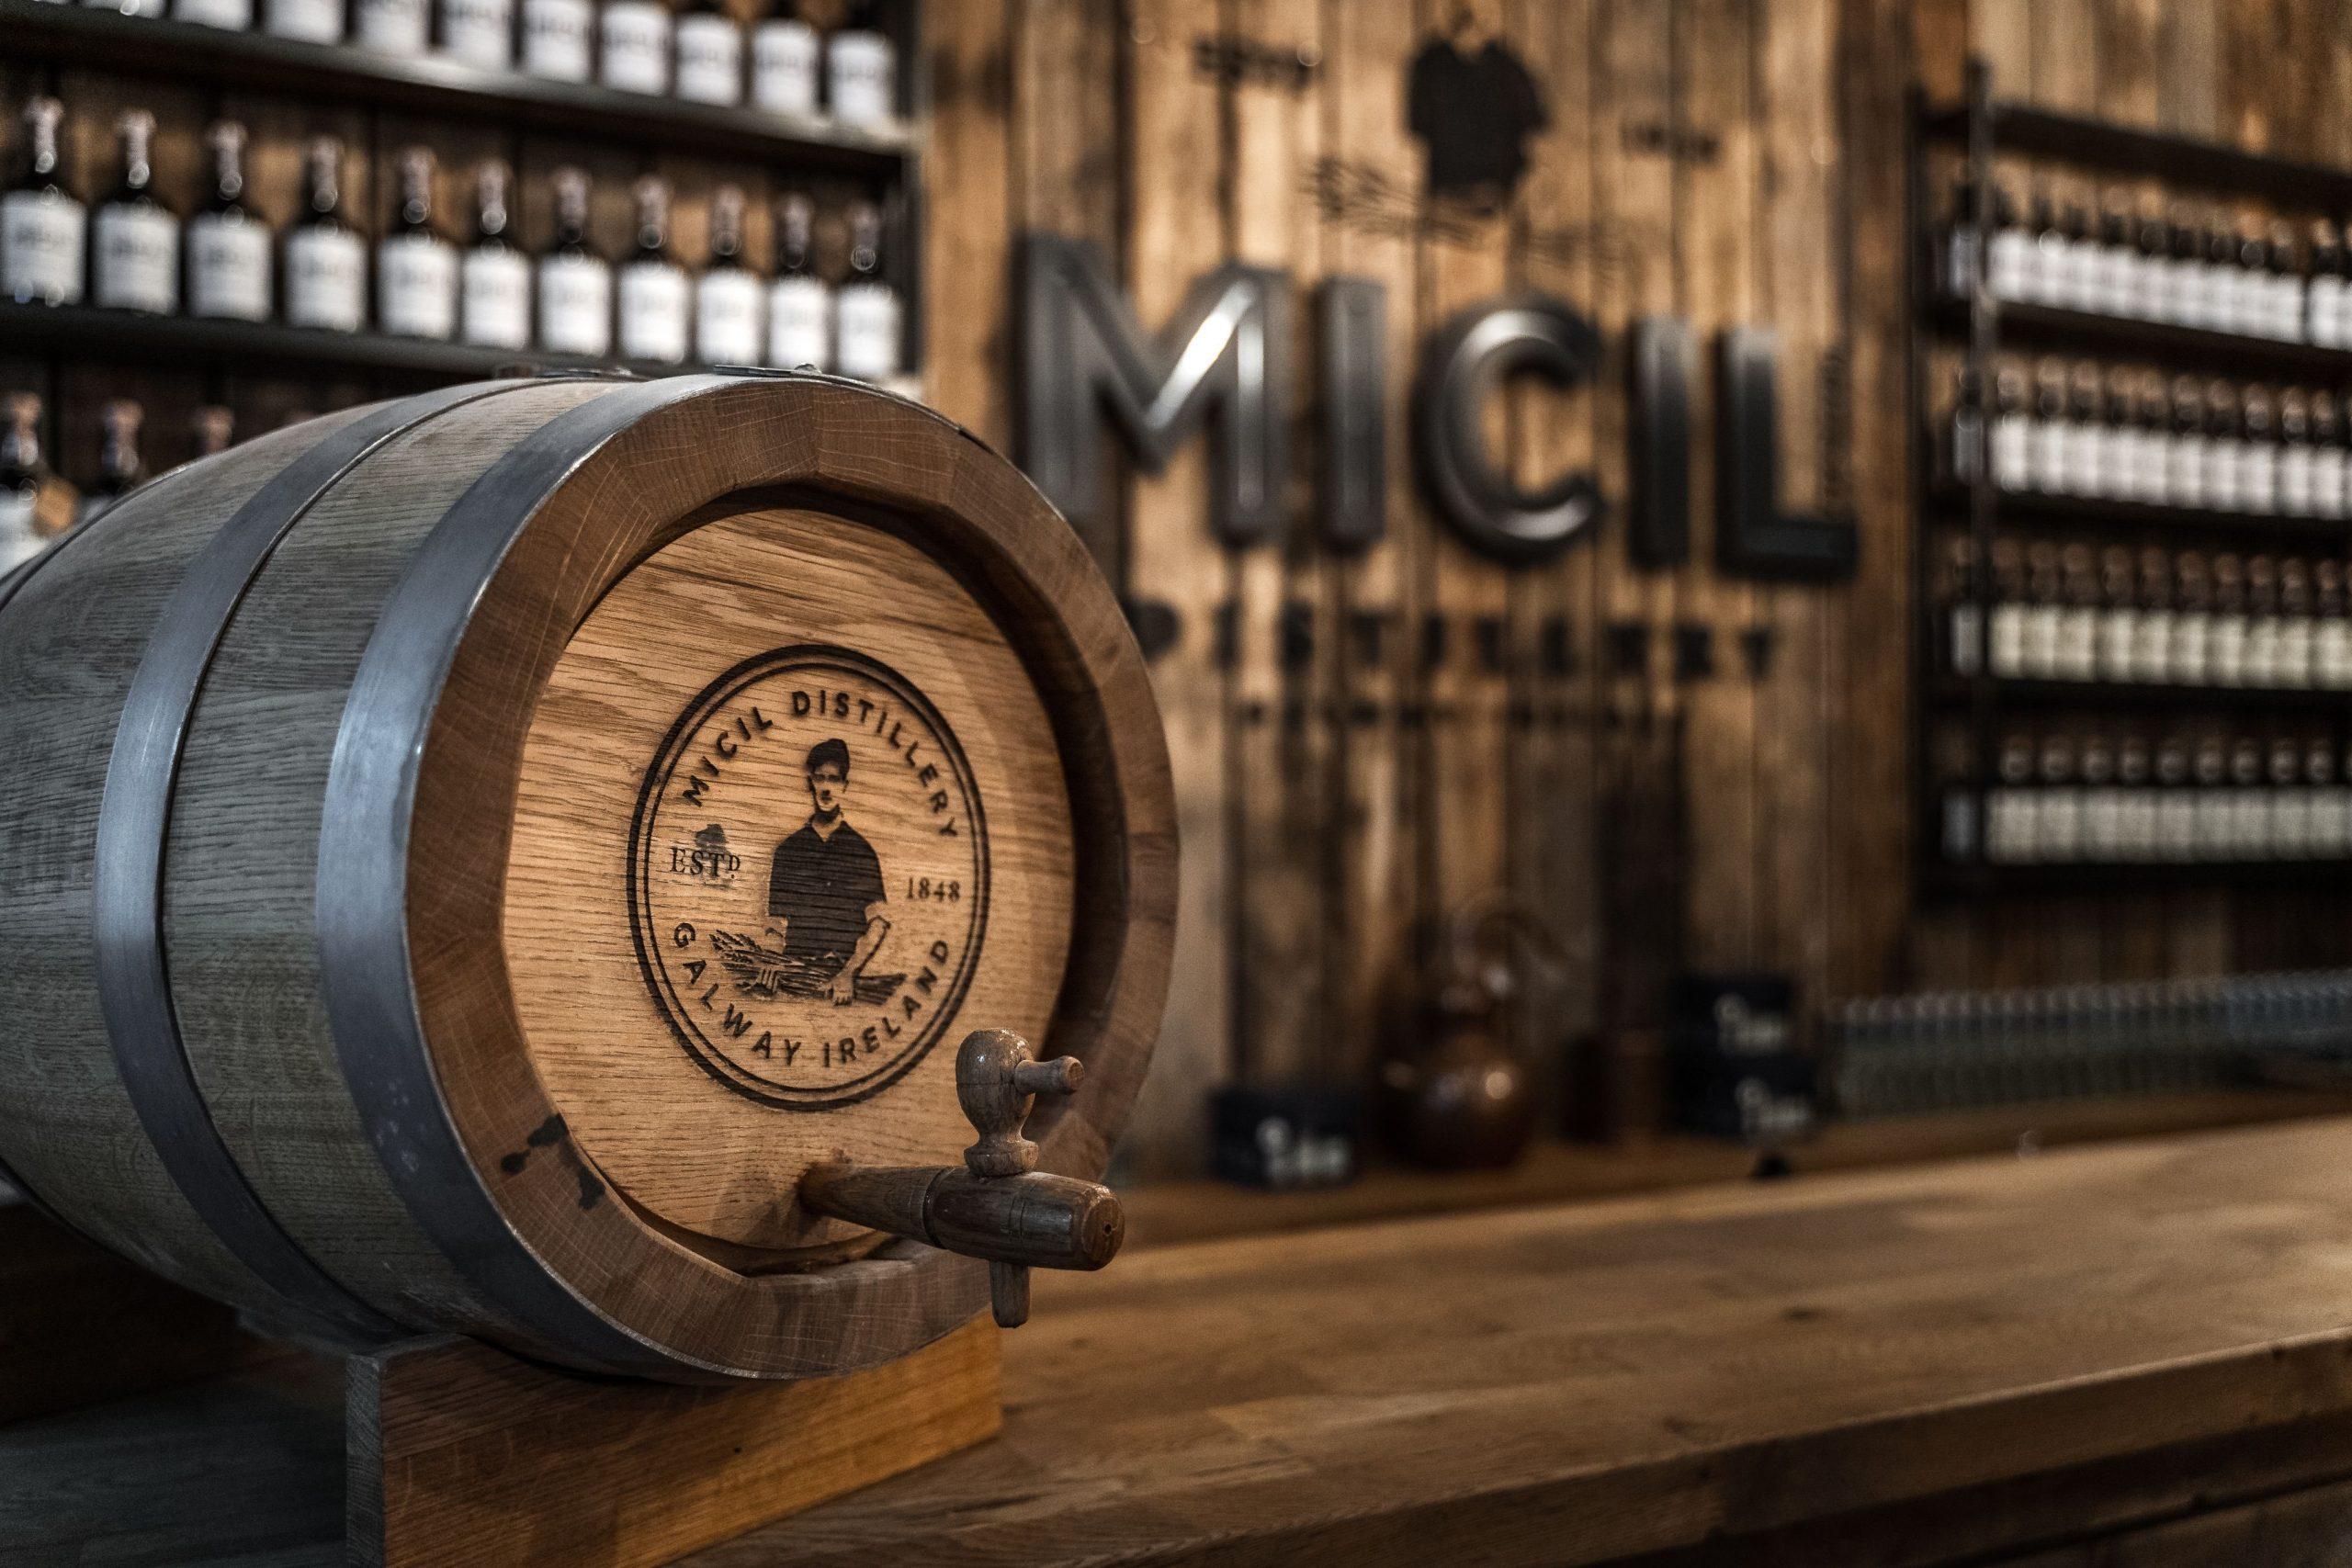 Padraic O'Griallais Micil Distillery Irish Whiskey Blogger Stuart Mcnamara Galway Whiskey Cask Sales